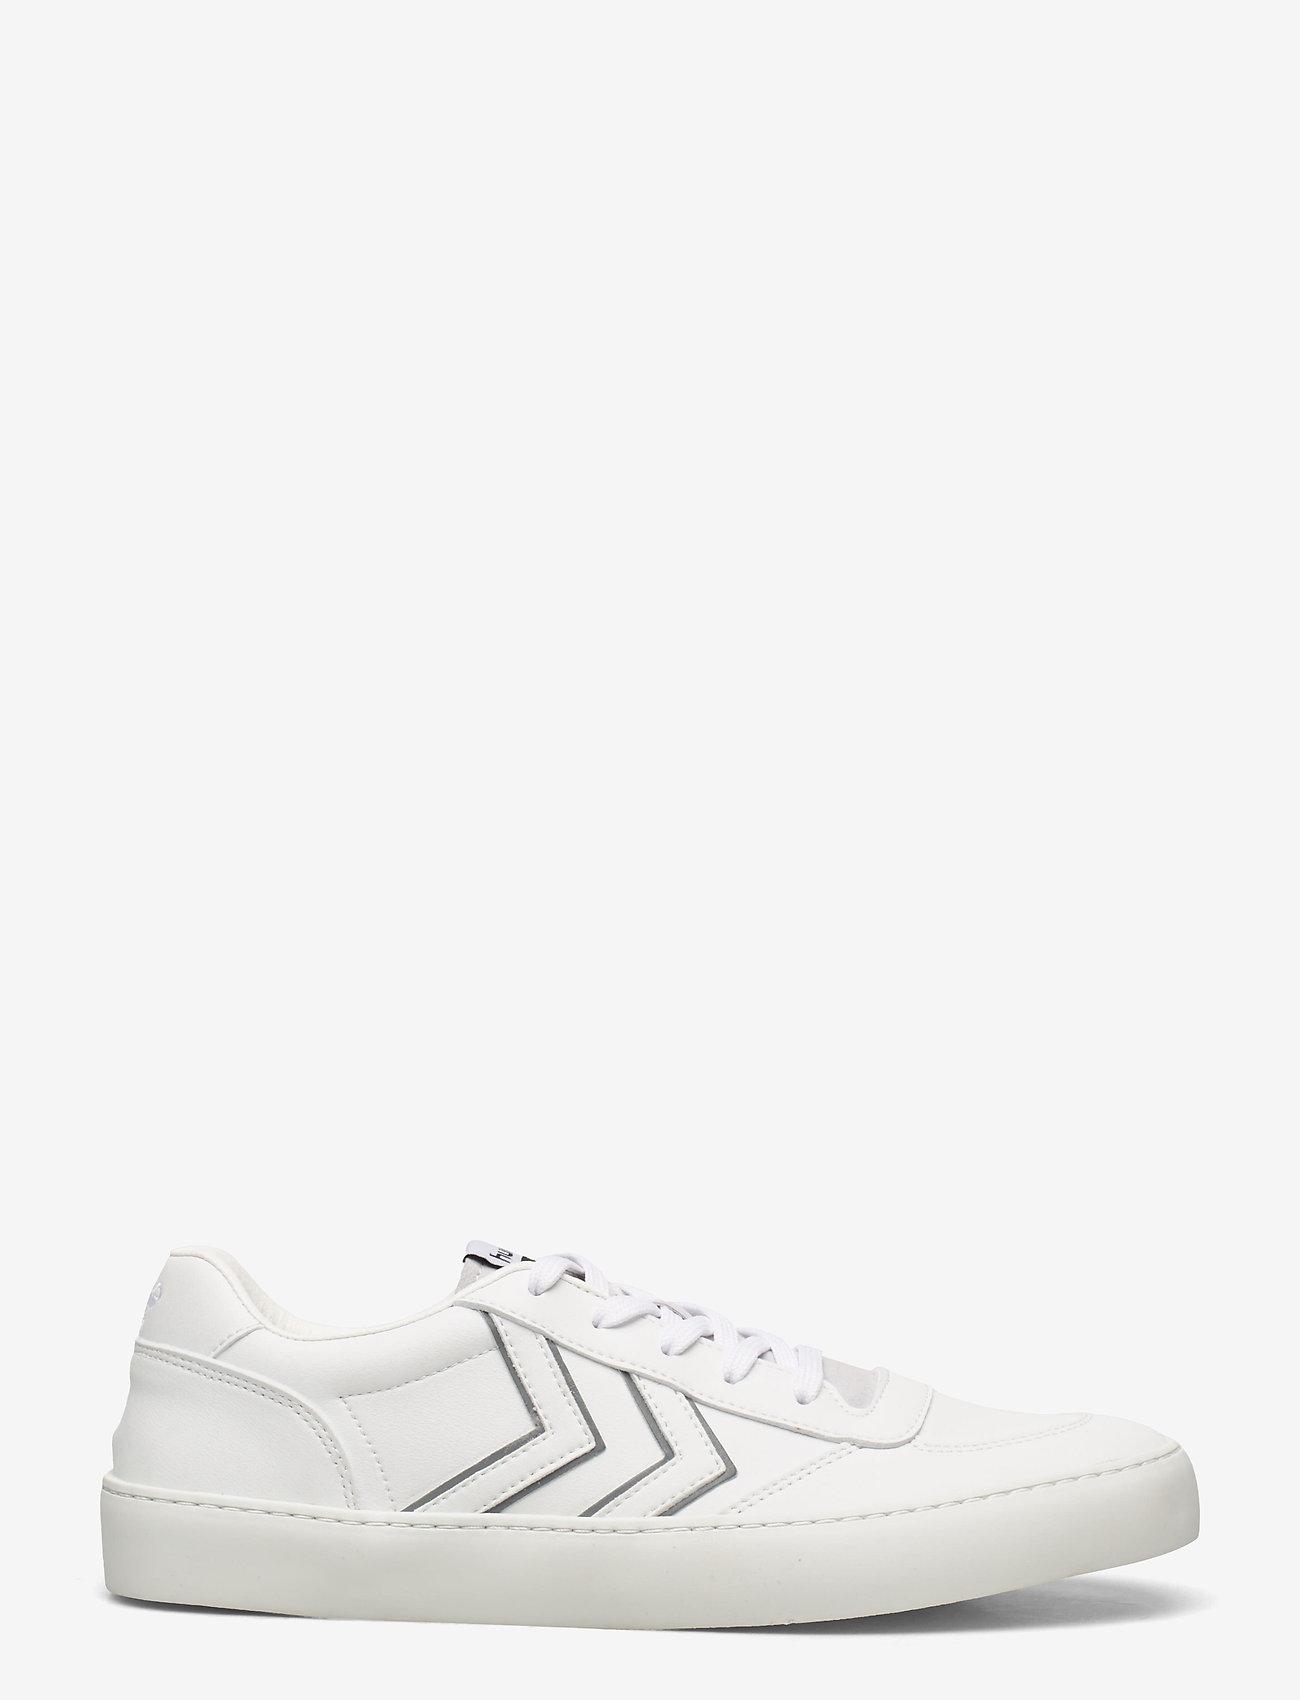 Hummel - STADIL 3.0 PREMIUM - laag sneakers - white - 0